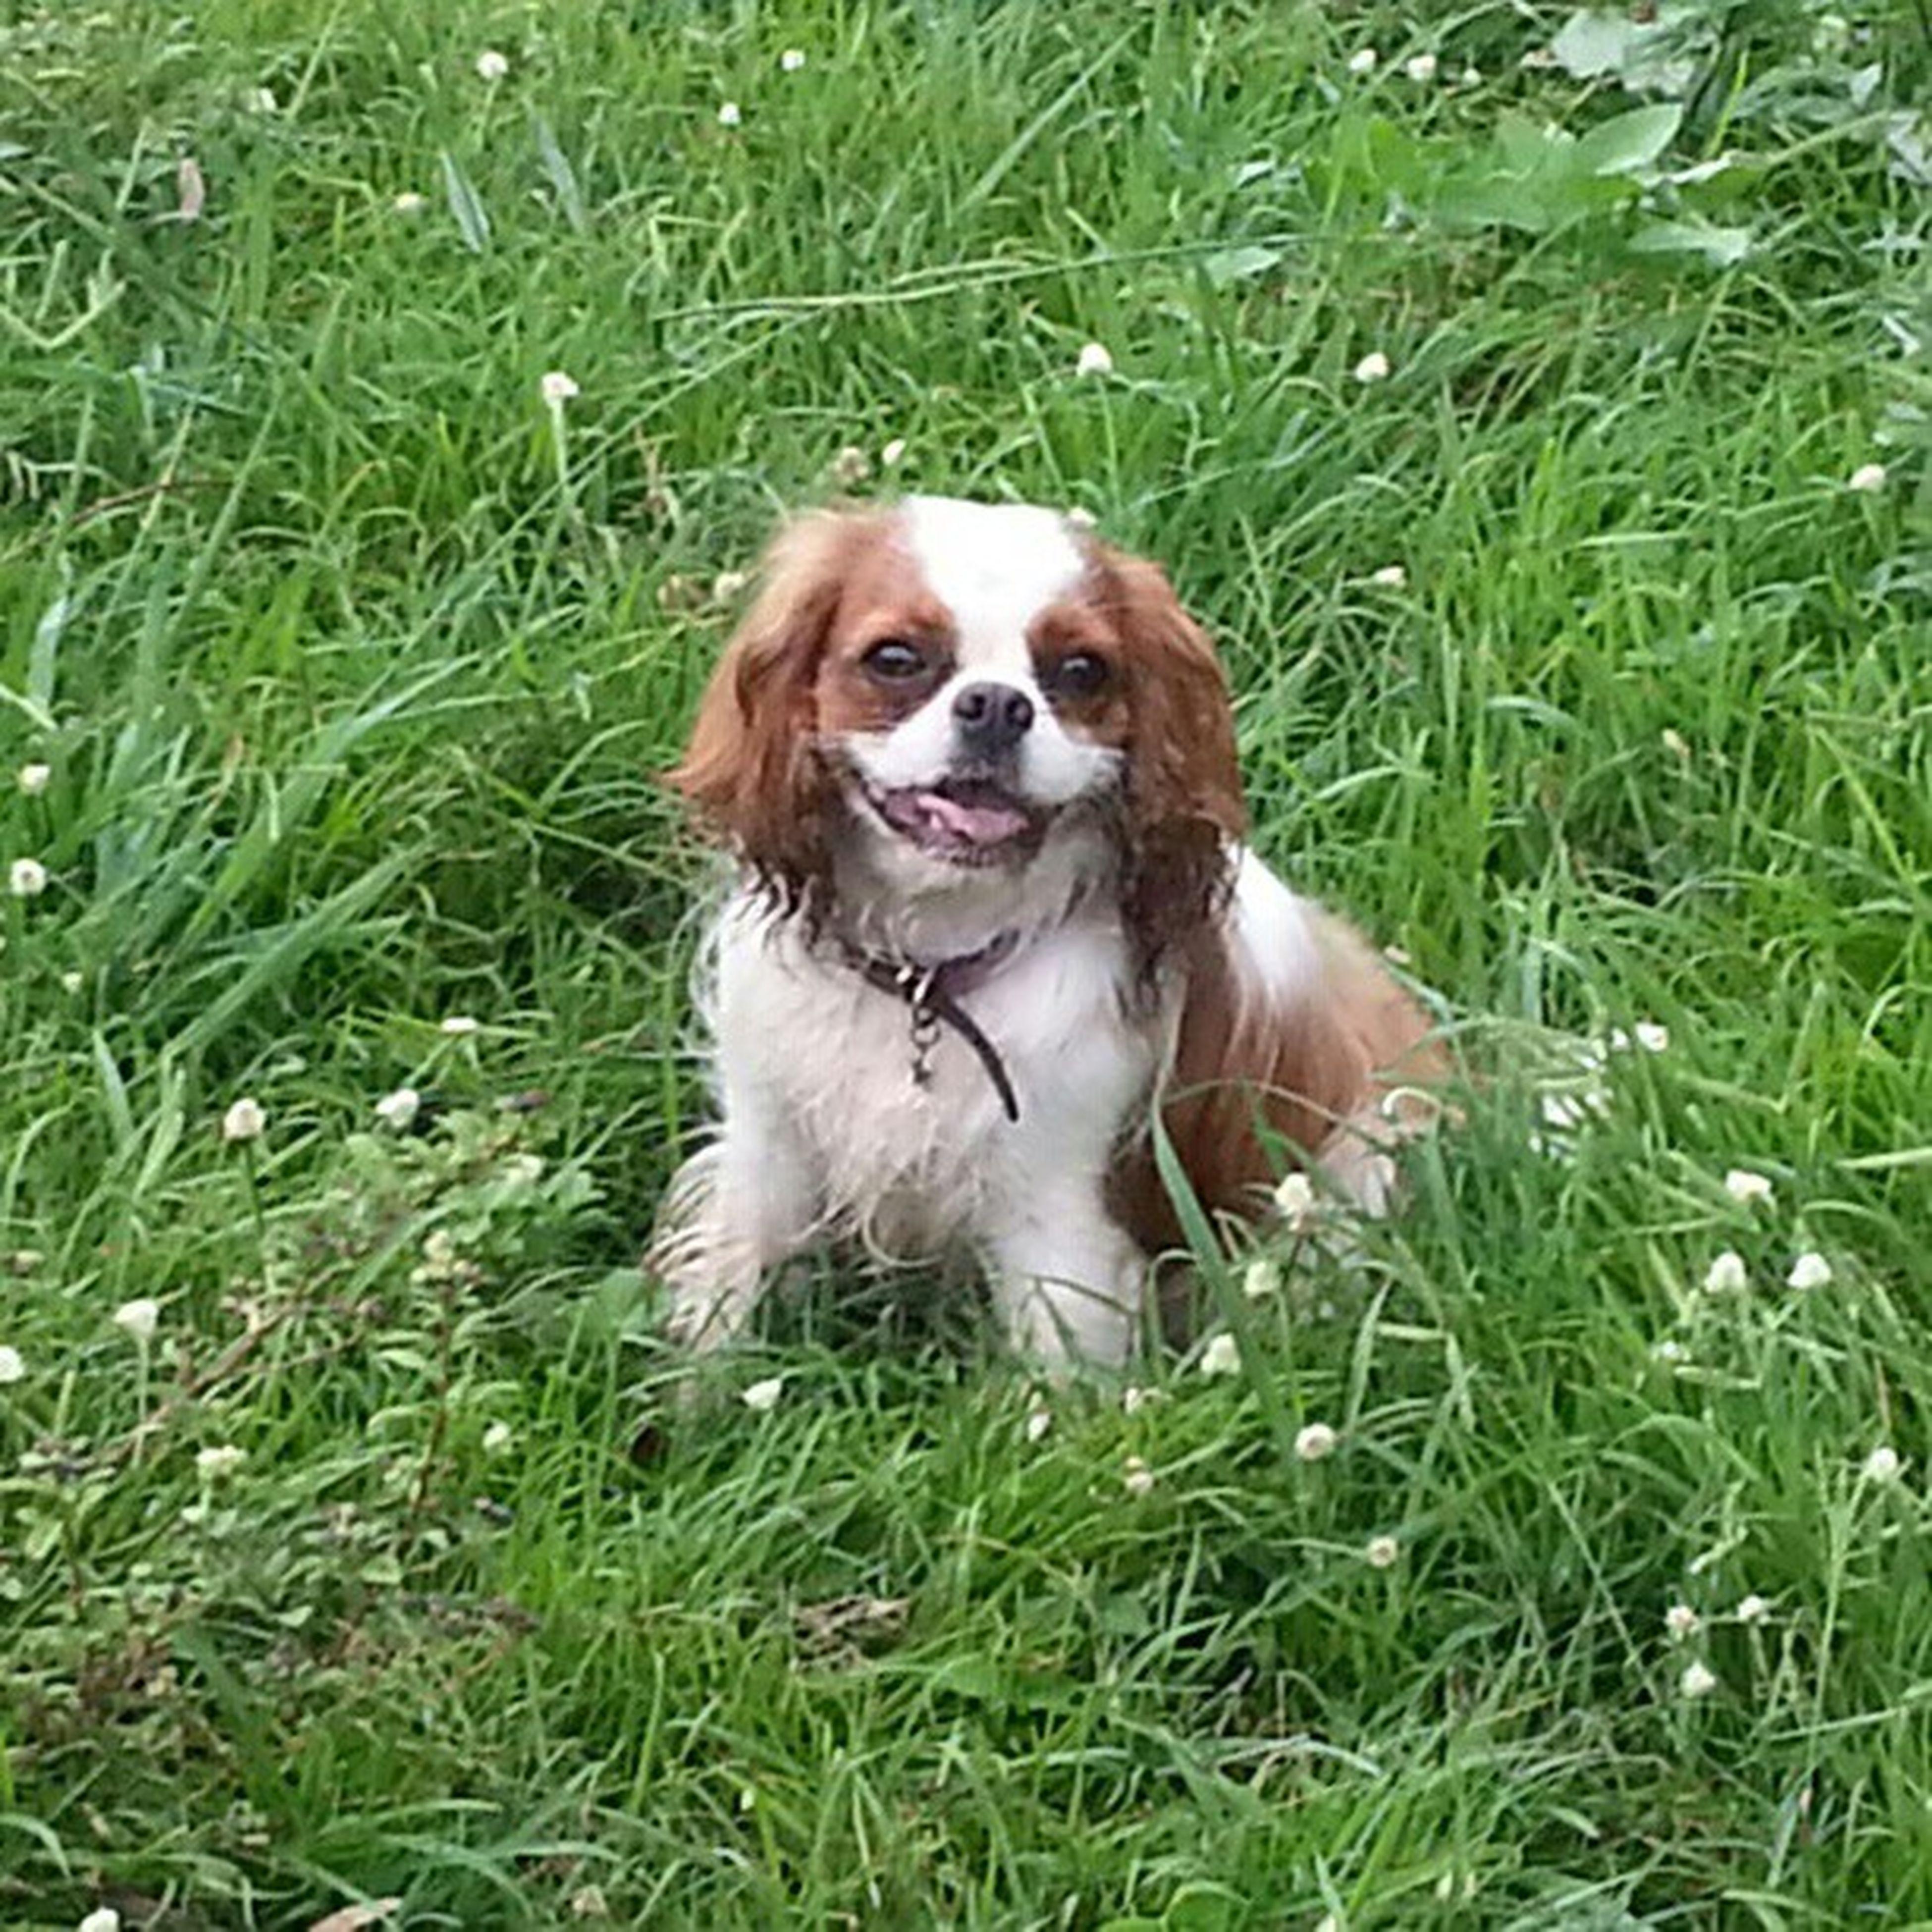 Cavalier  King Charles Spaniel cute dog in grass chelsea